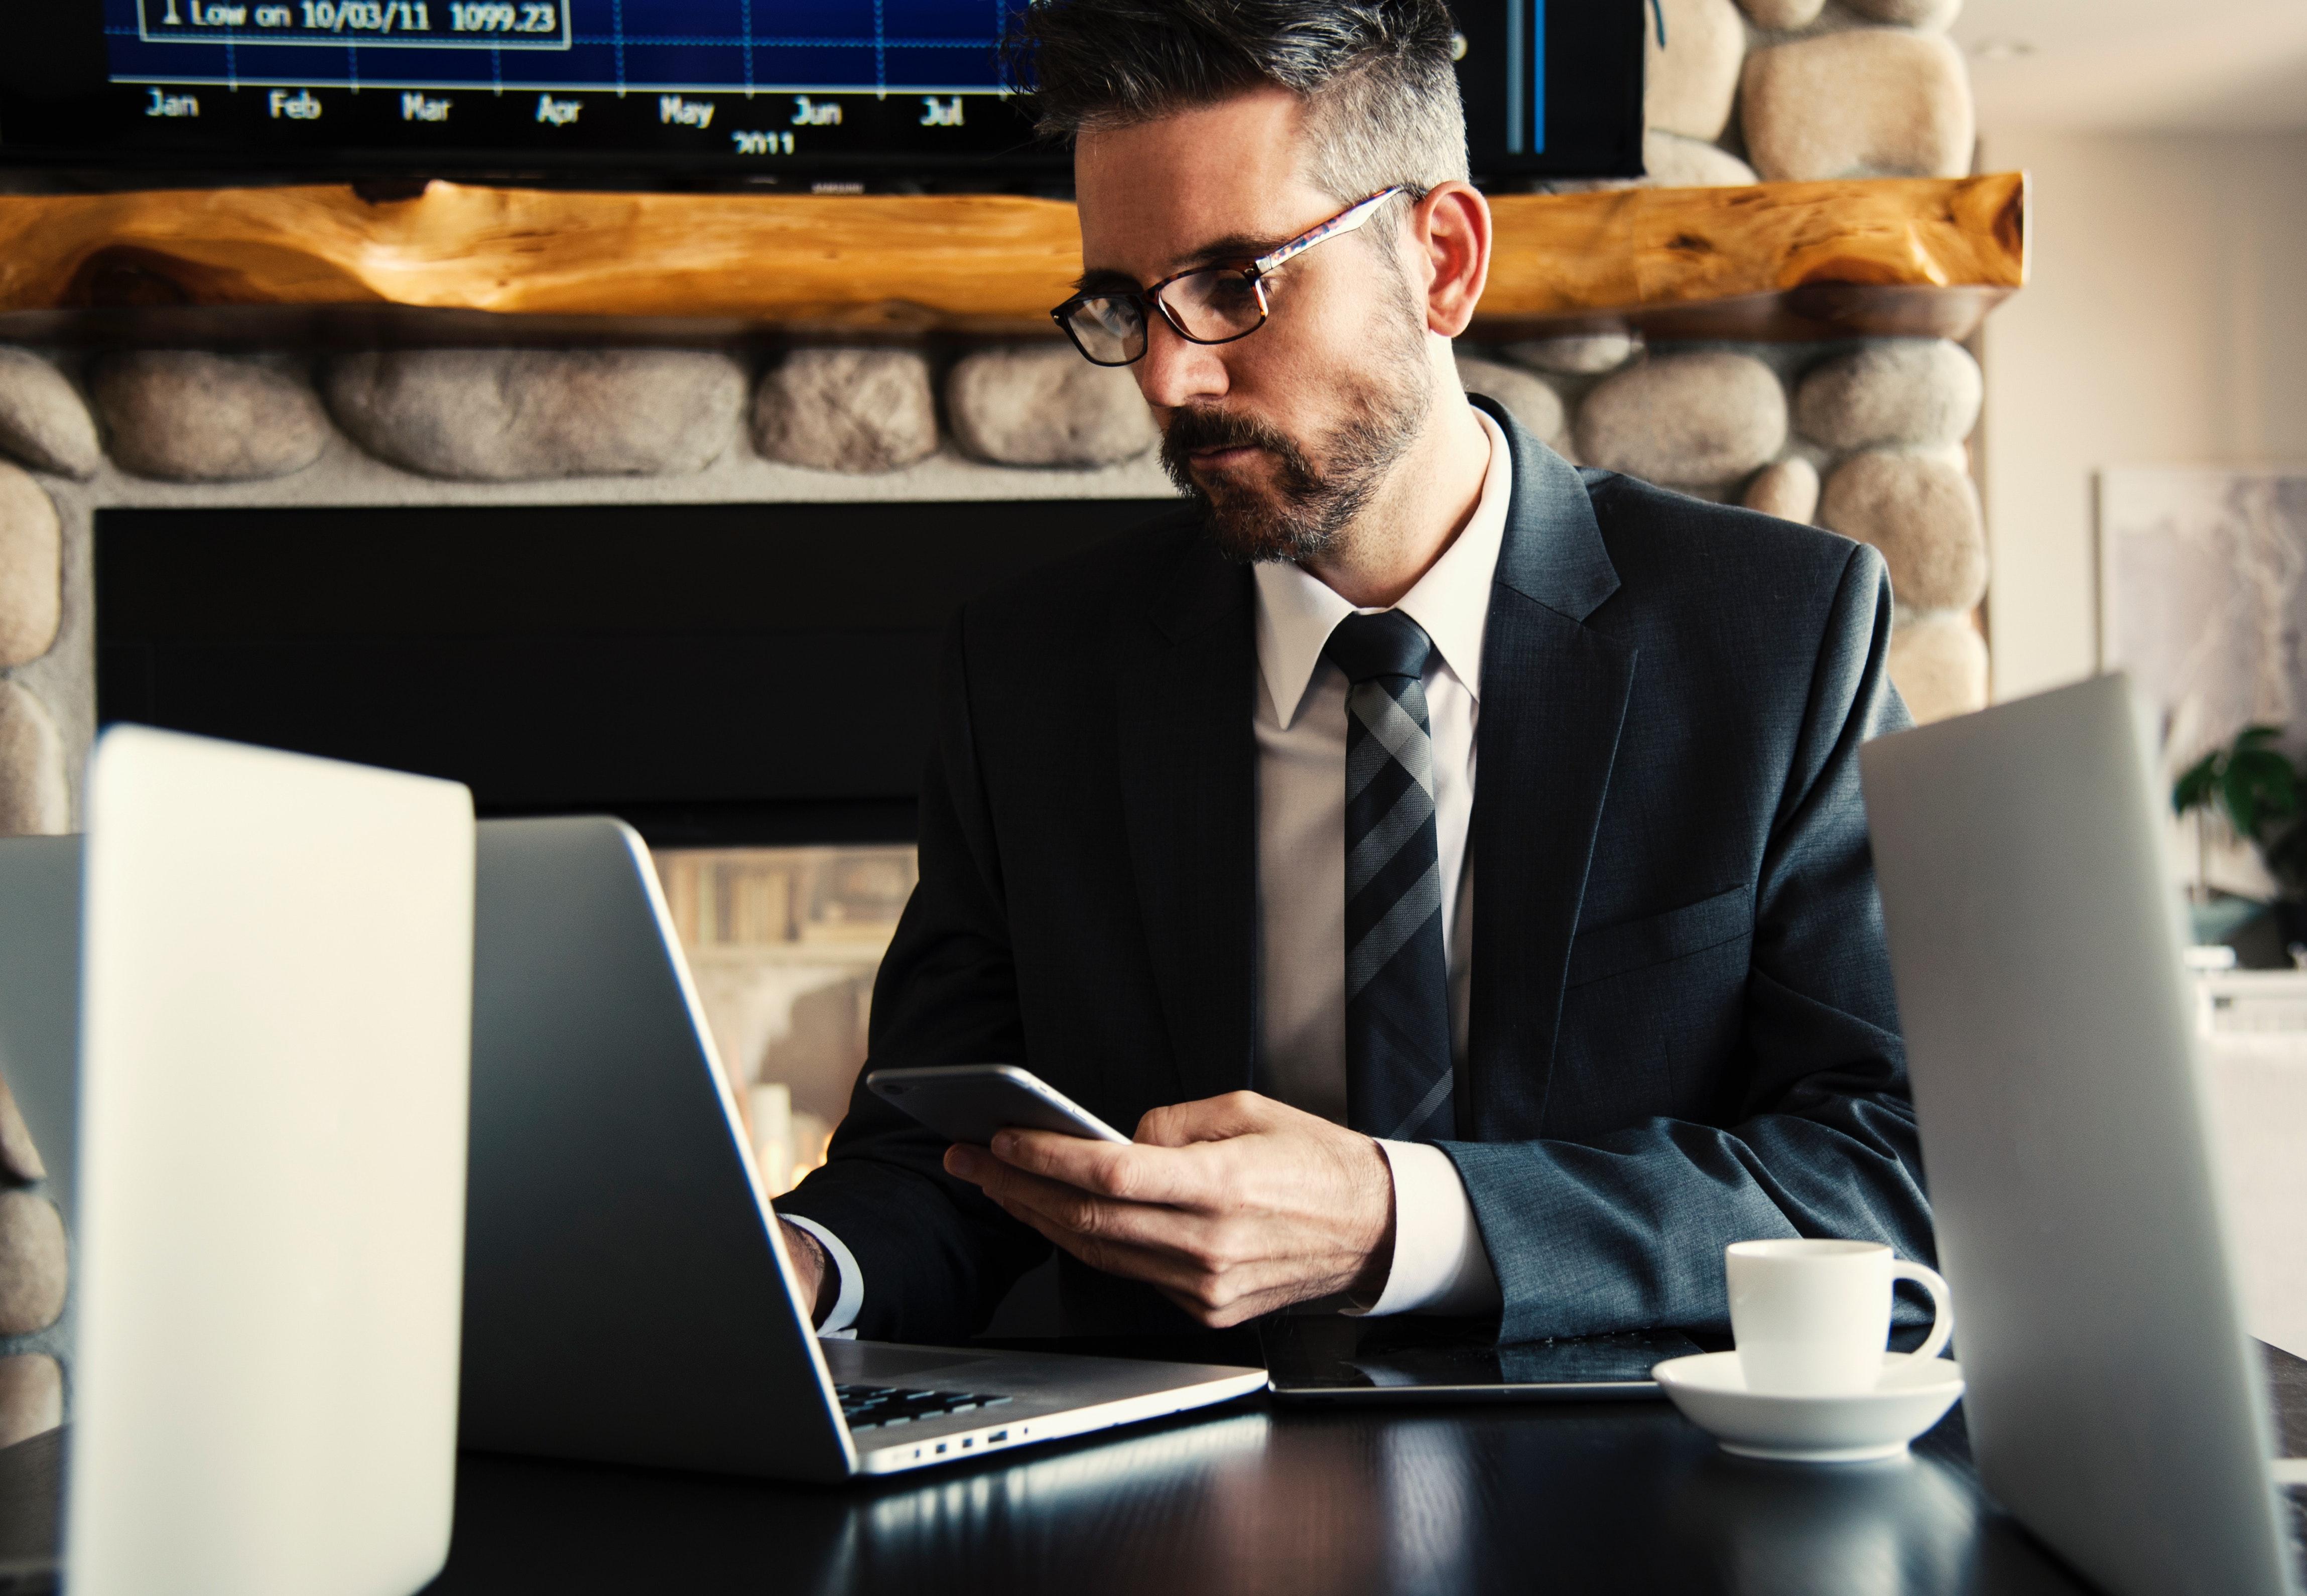 adult-business-businessman-618613